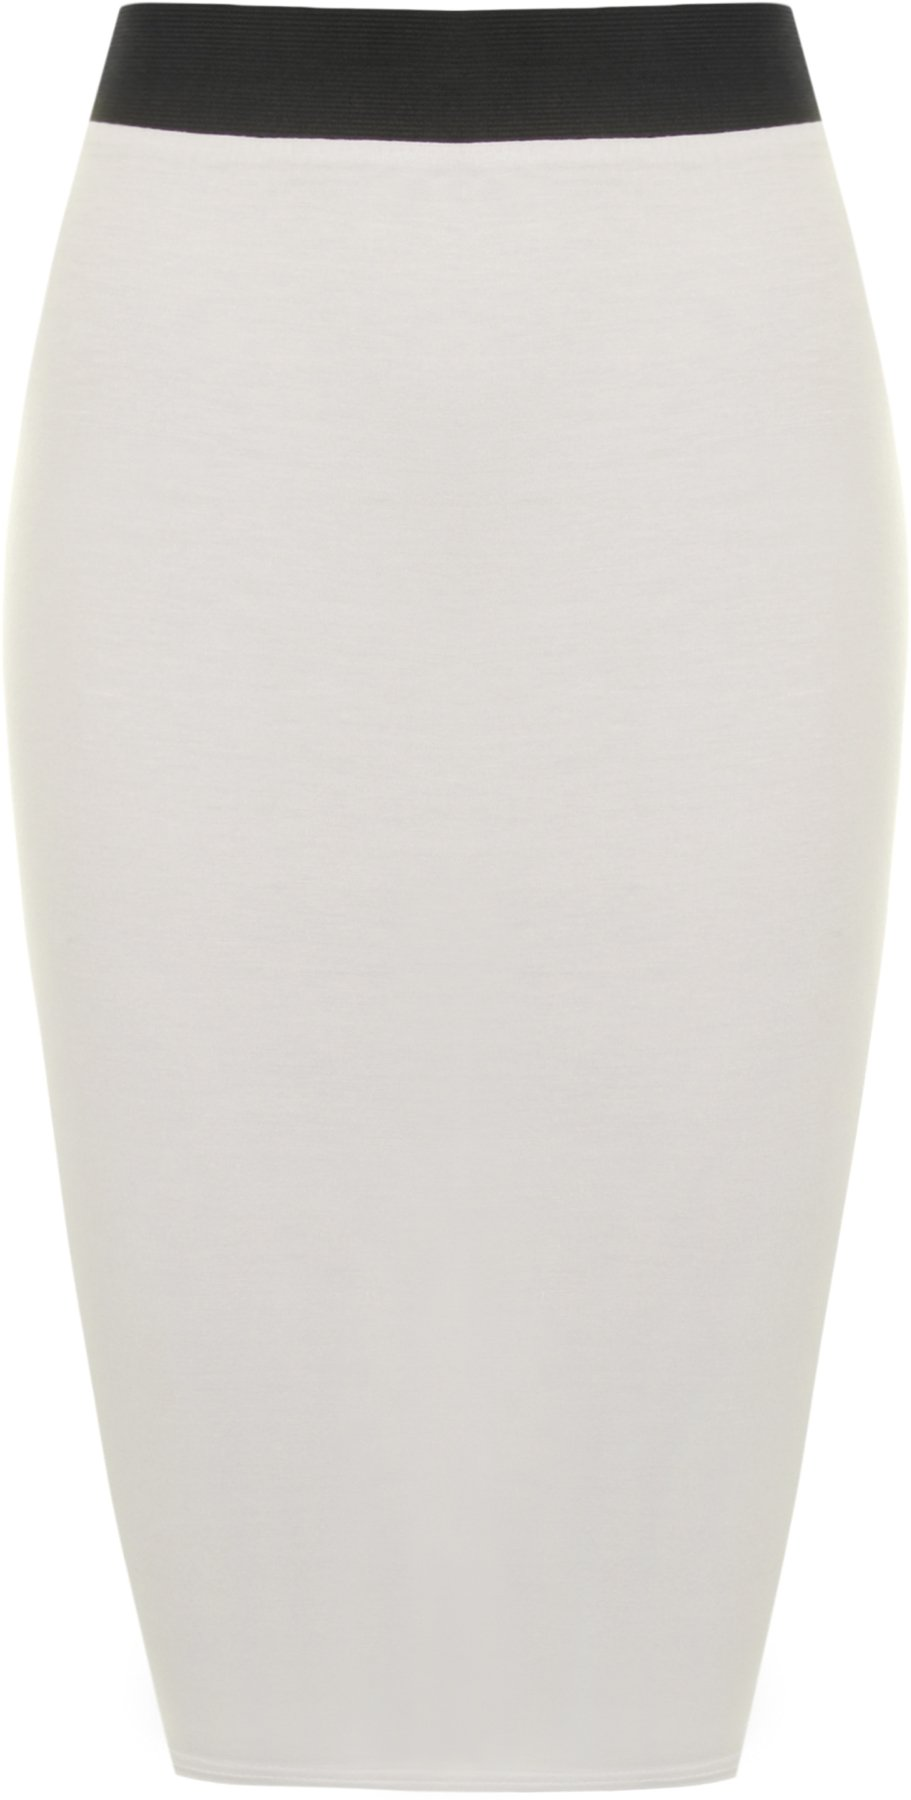 WearAll Women's Plus Size Plain Bodycon Mid Skirt - Cream - US 16-18 (UK 20-22)